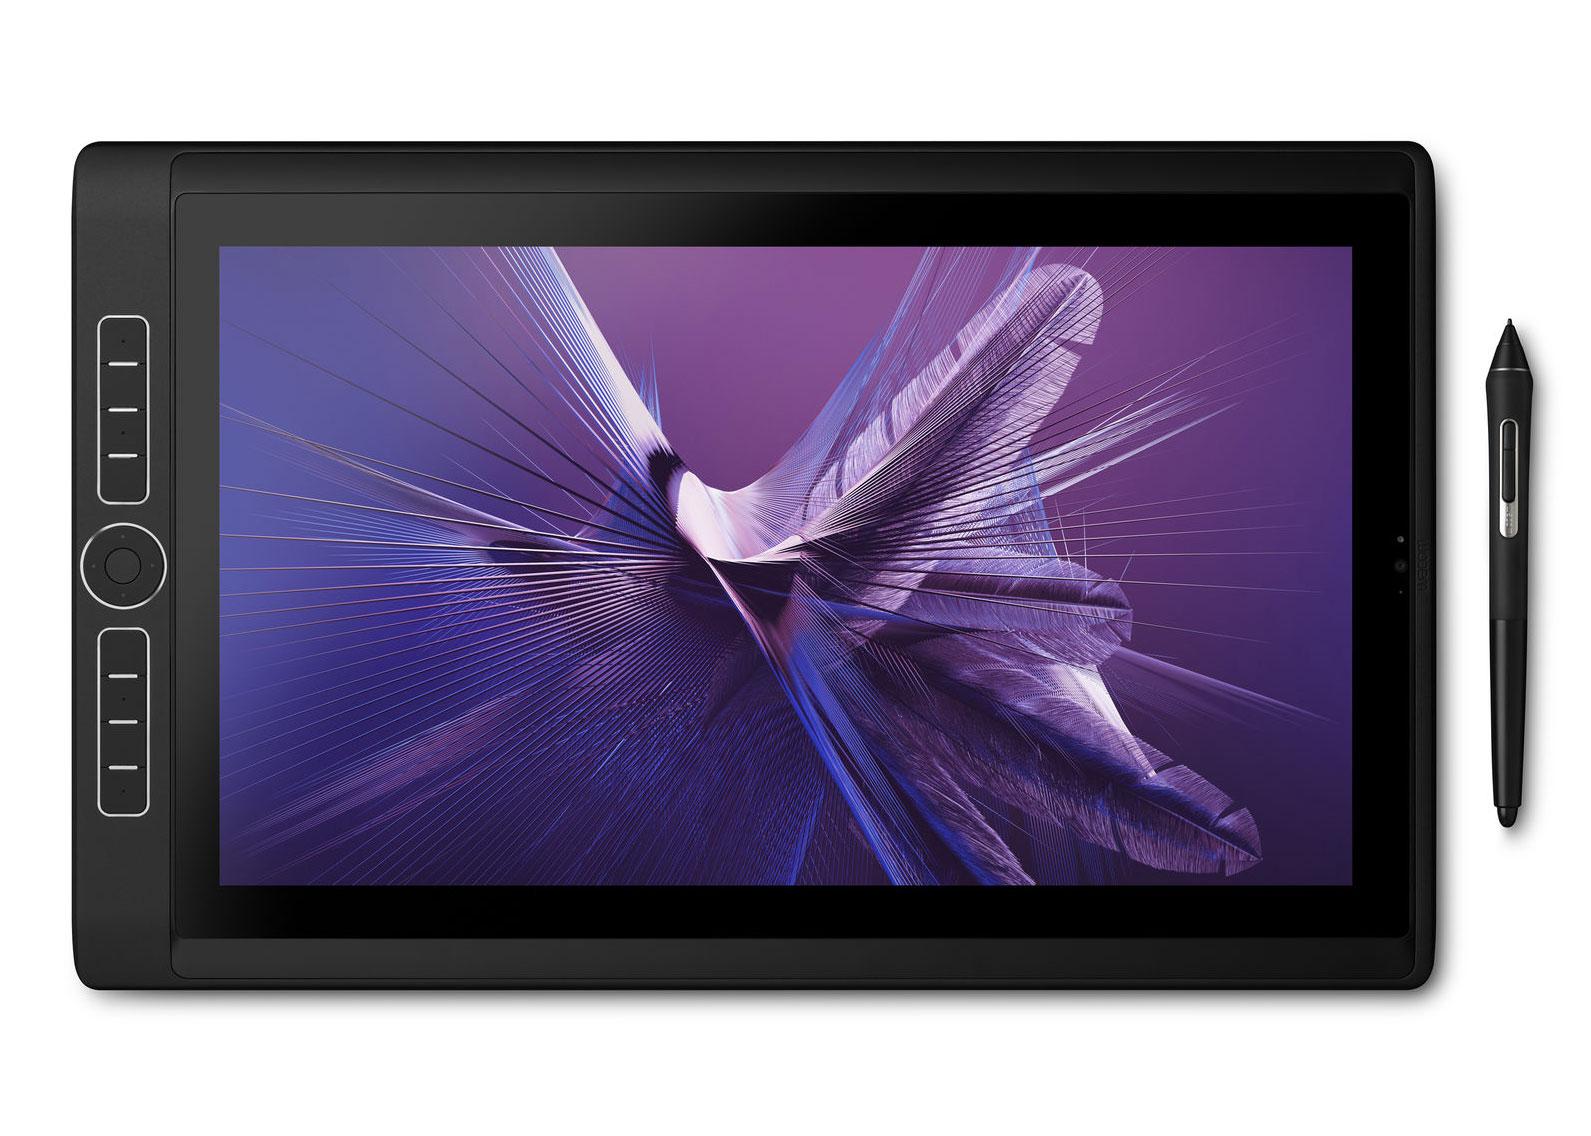 Wacom releases new Wacom MobileStudio Pro 16 graphics tablet | Digital Camera World